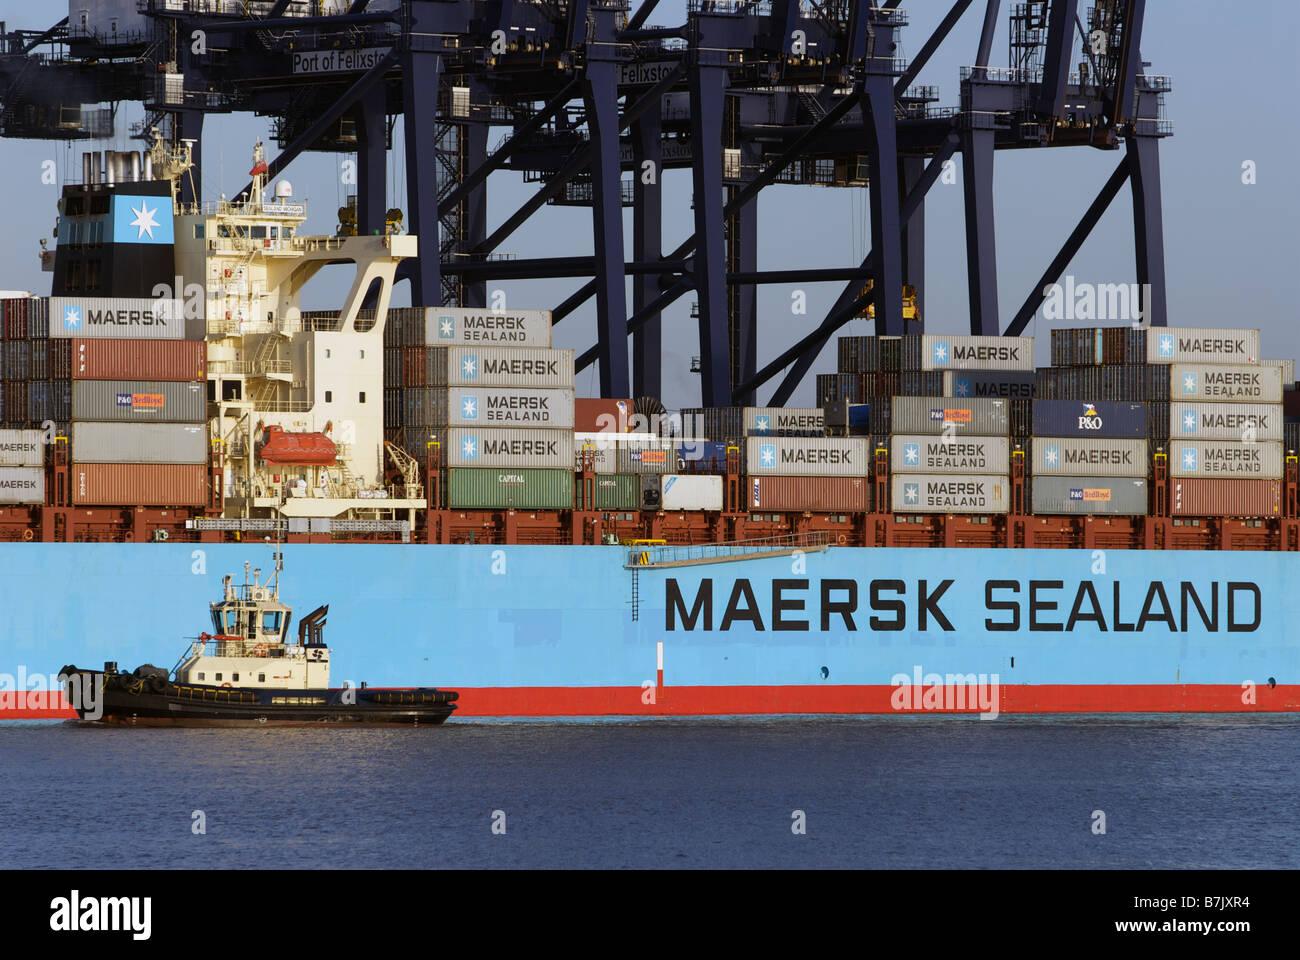 Maersk Sealand Stock Photos & Maersk Sealand Stock Images